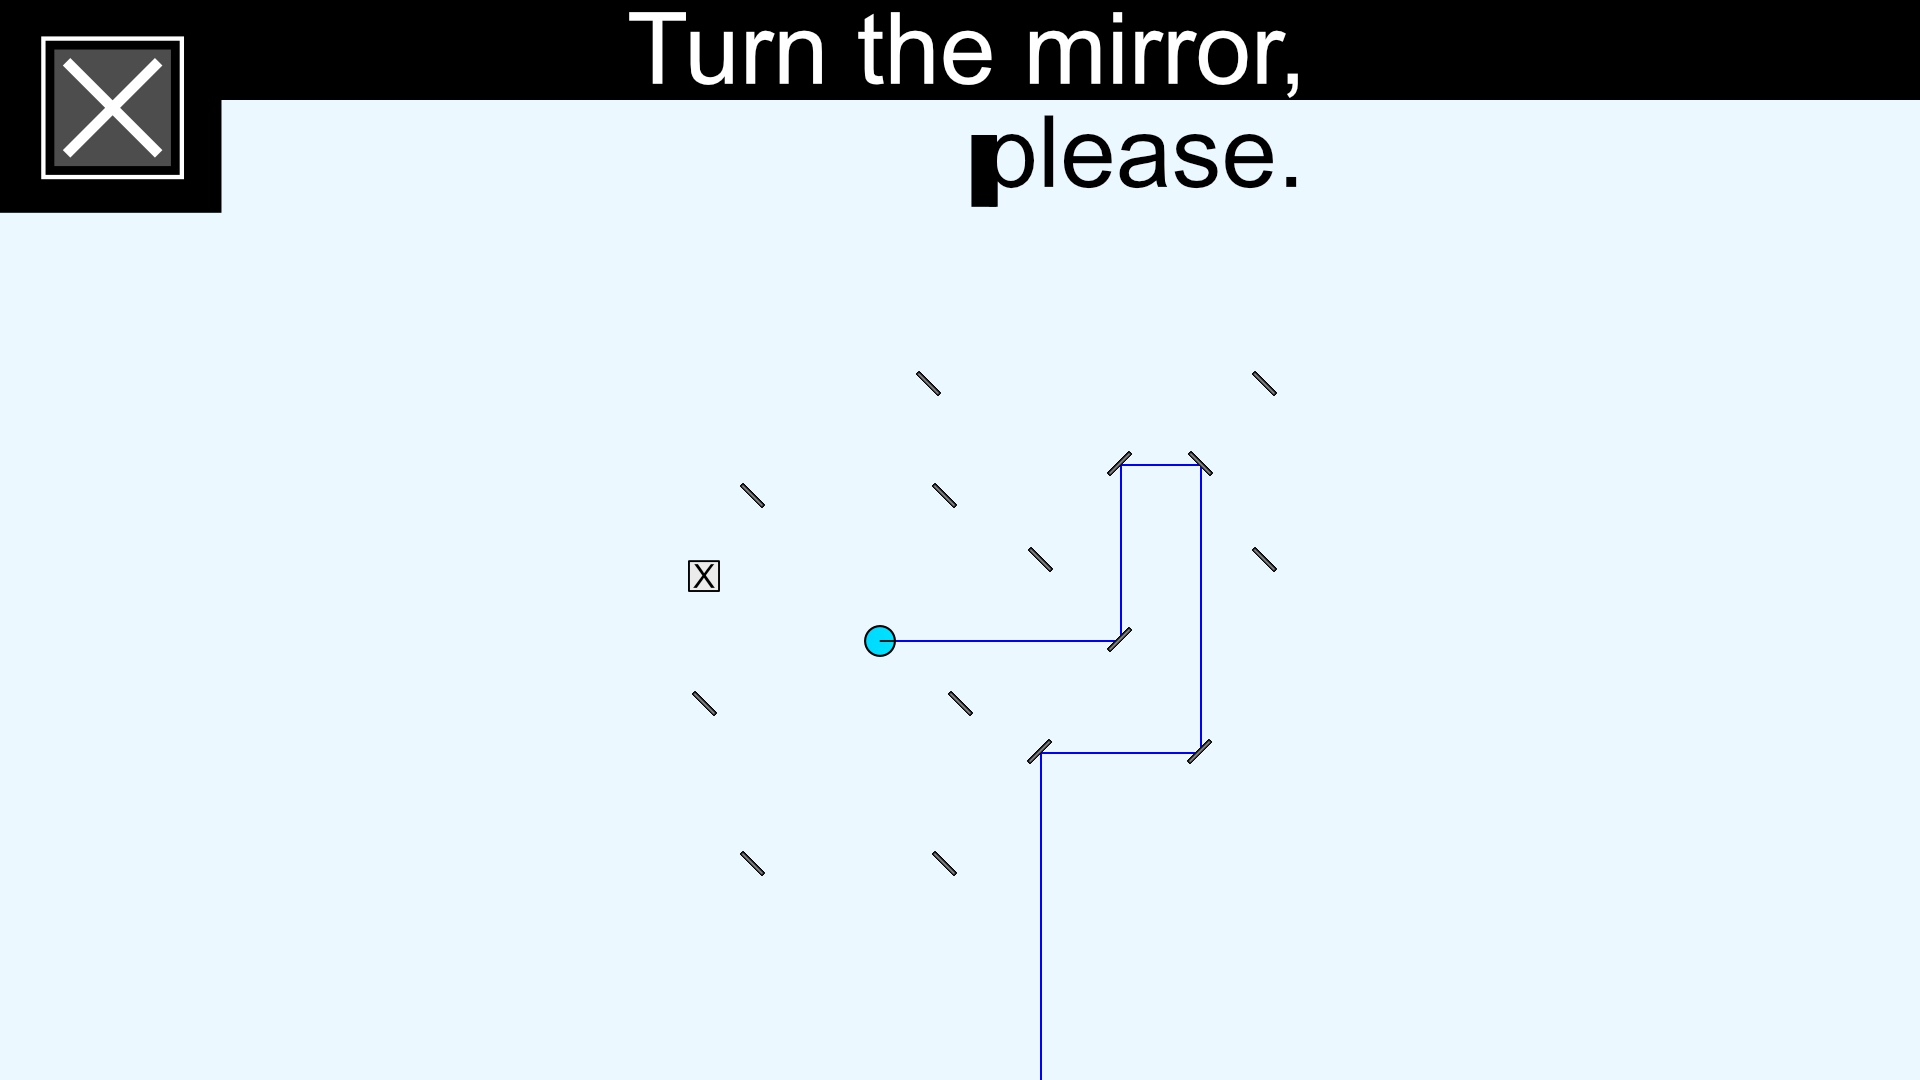 Turn the mirror, please. screenshot